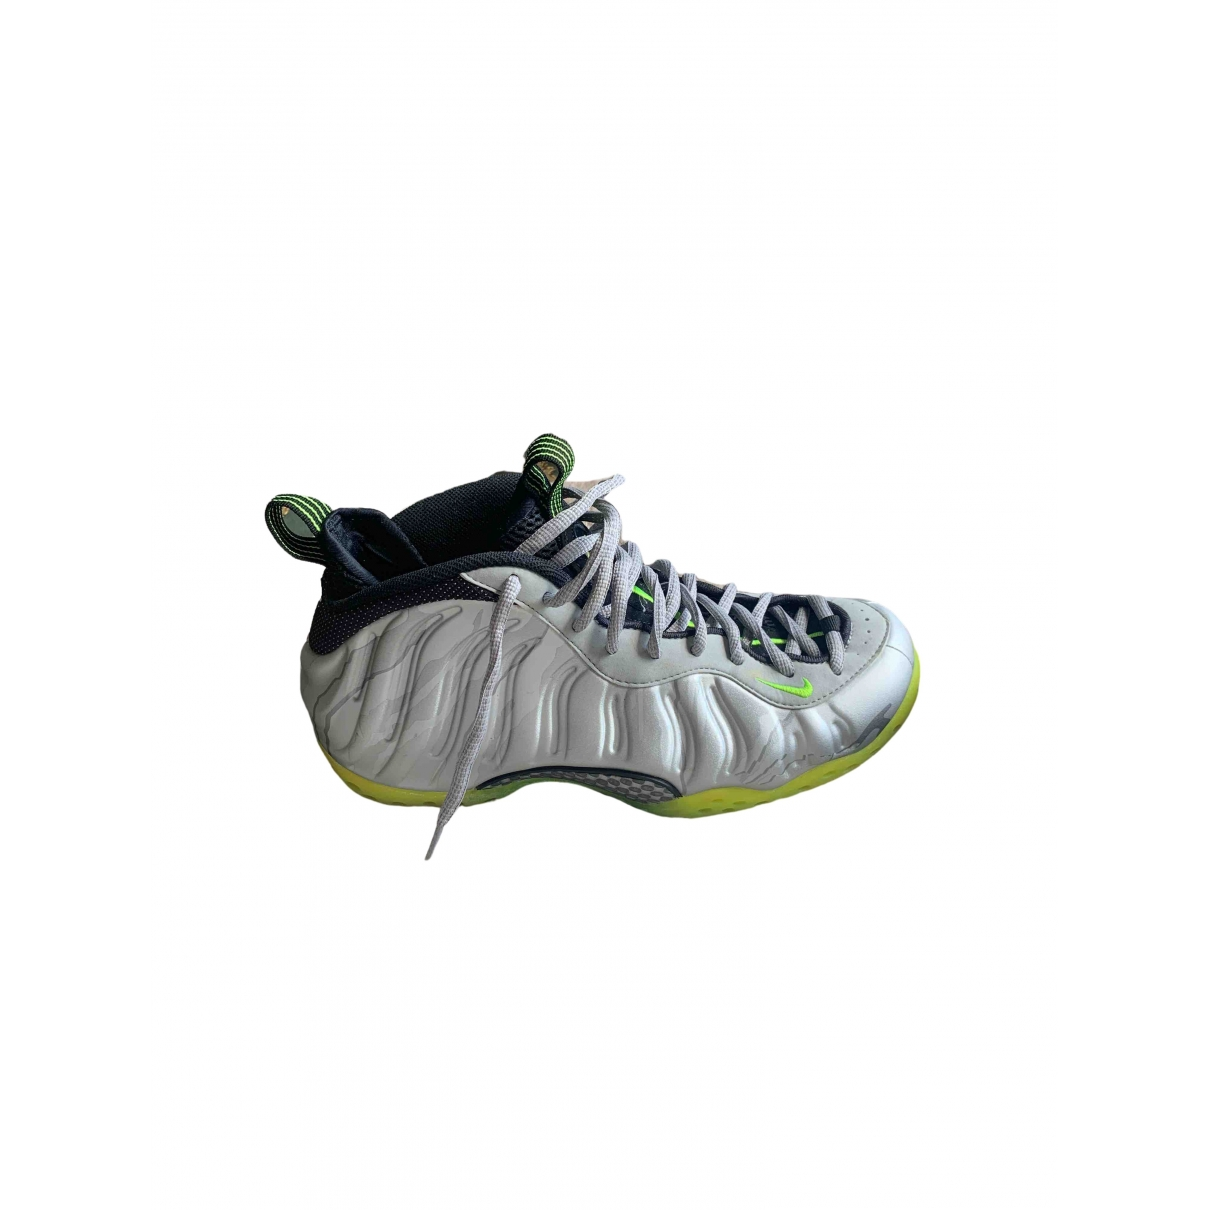 Nike Air Foamposite Sneakers in  Silber Kautschuk